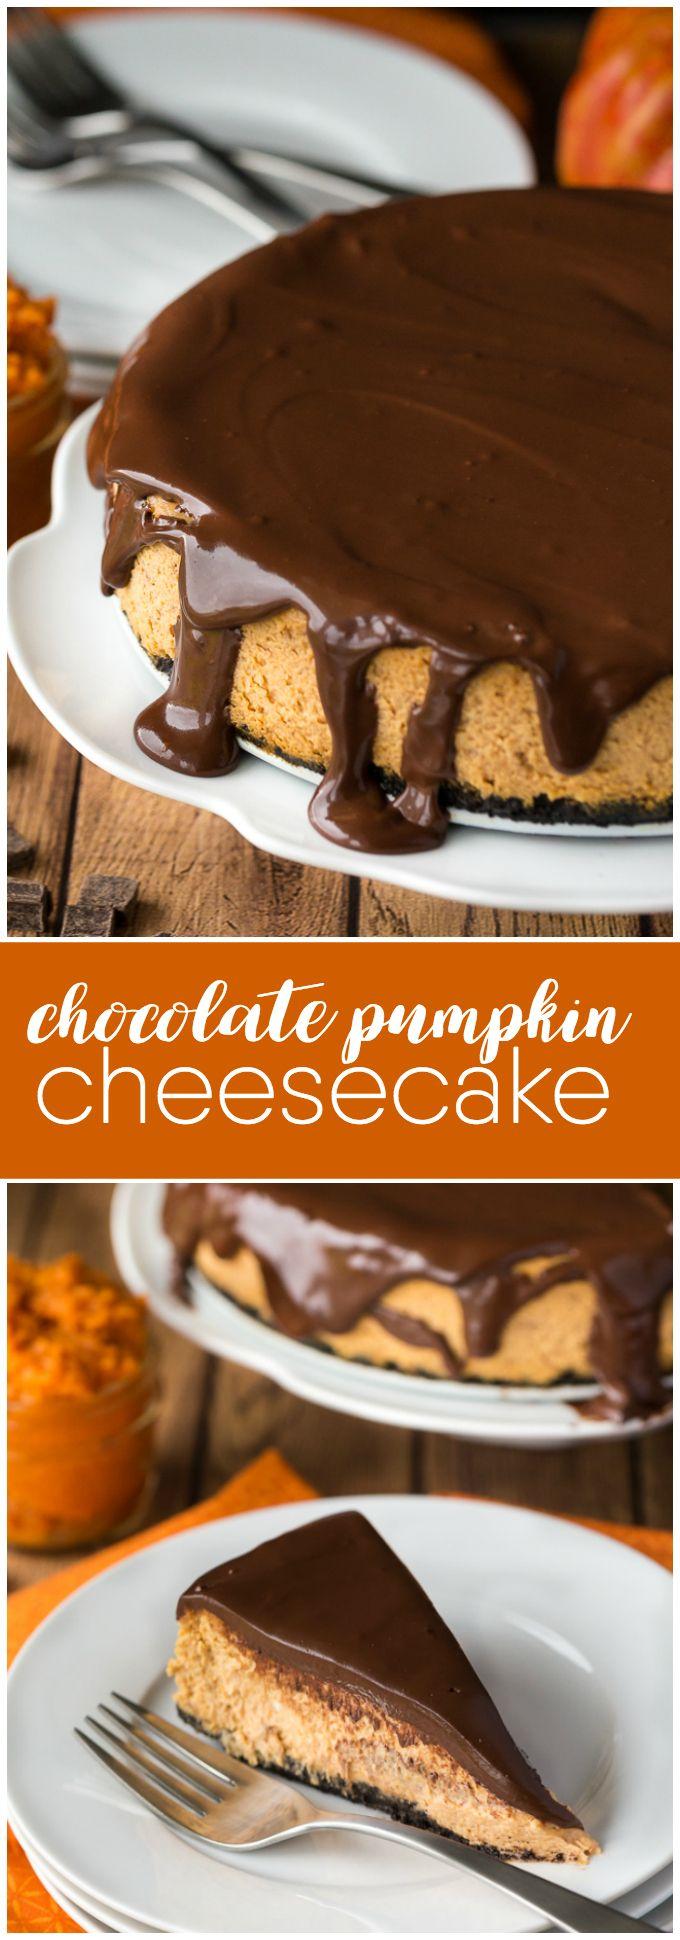 Chocolate Pumpkin Cheesecake - Prepared with a chocolate cookie crumb crust and…